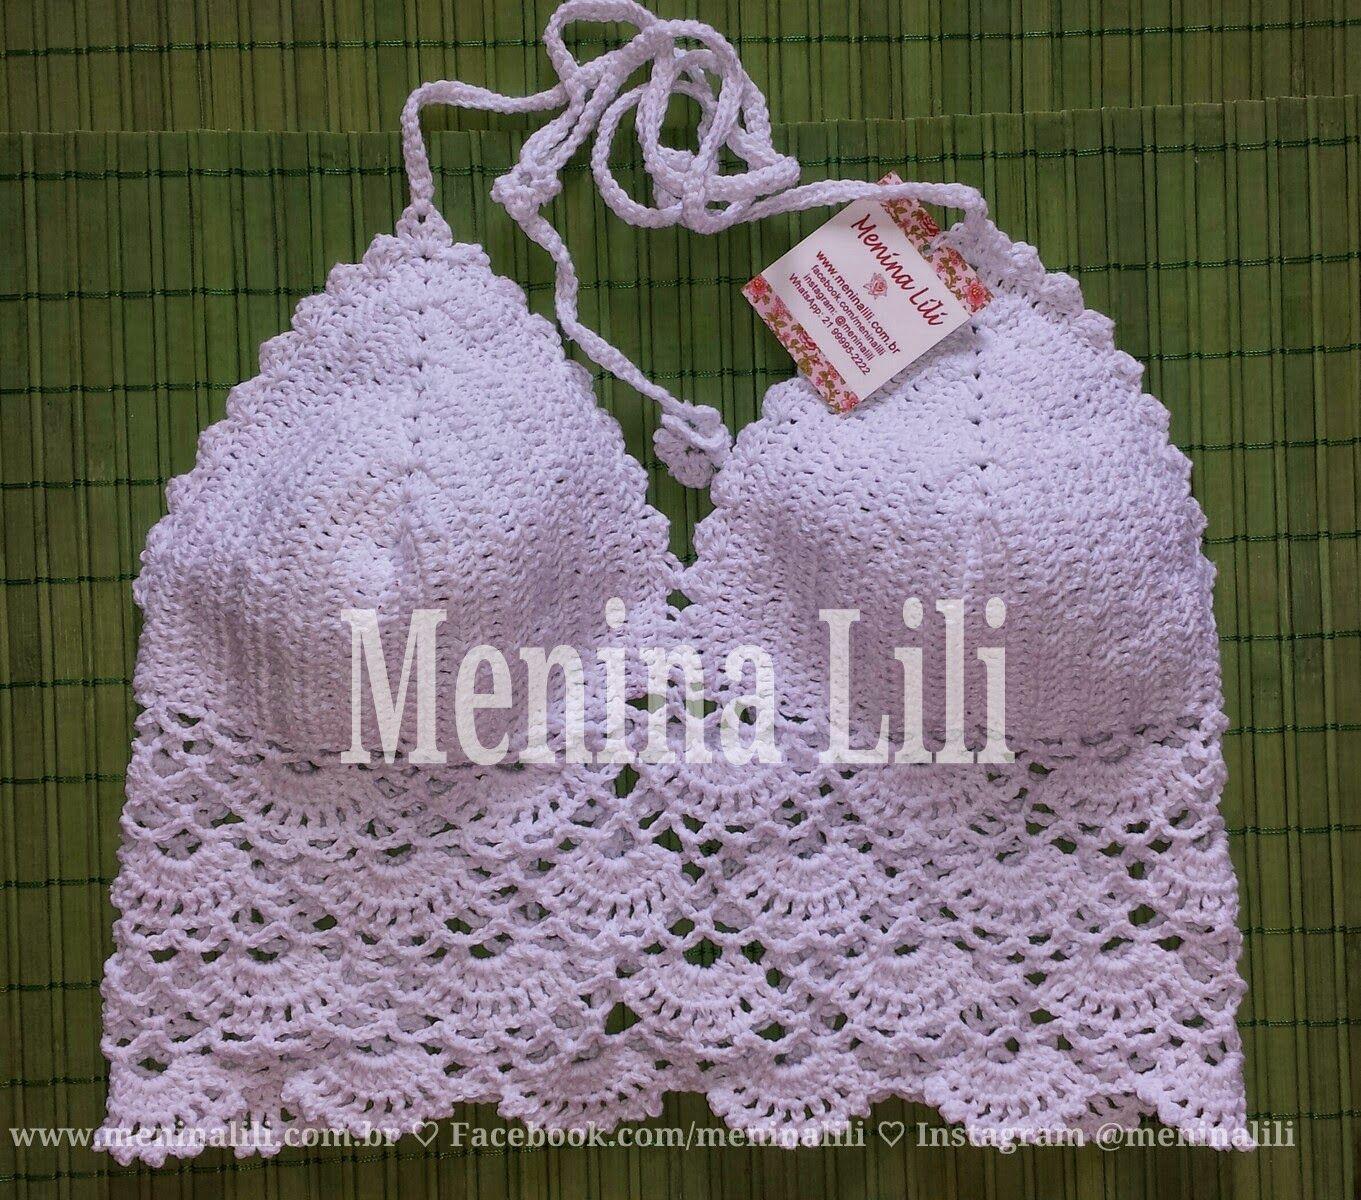 Menina Lili Croche: Encomendas voando.. Top Cropped de Crochê e Biquínis Menina Lili